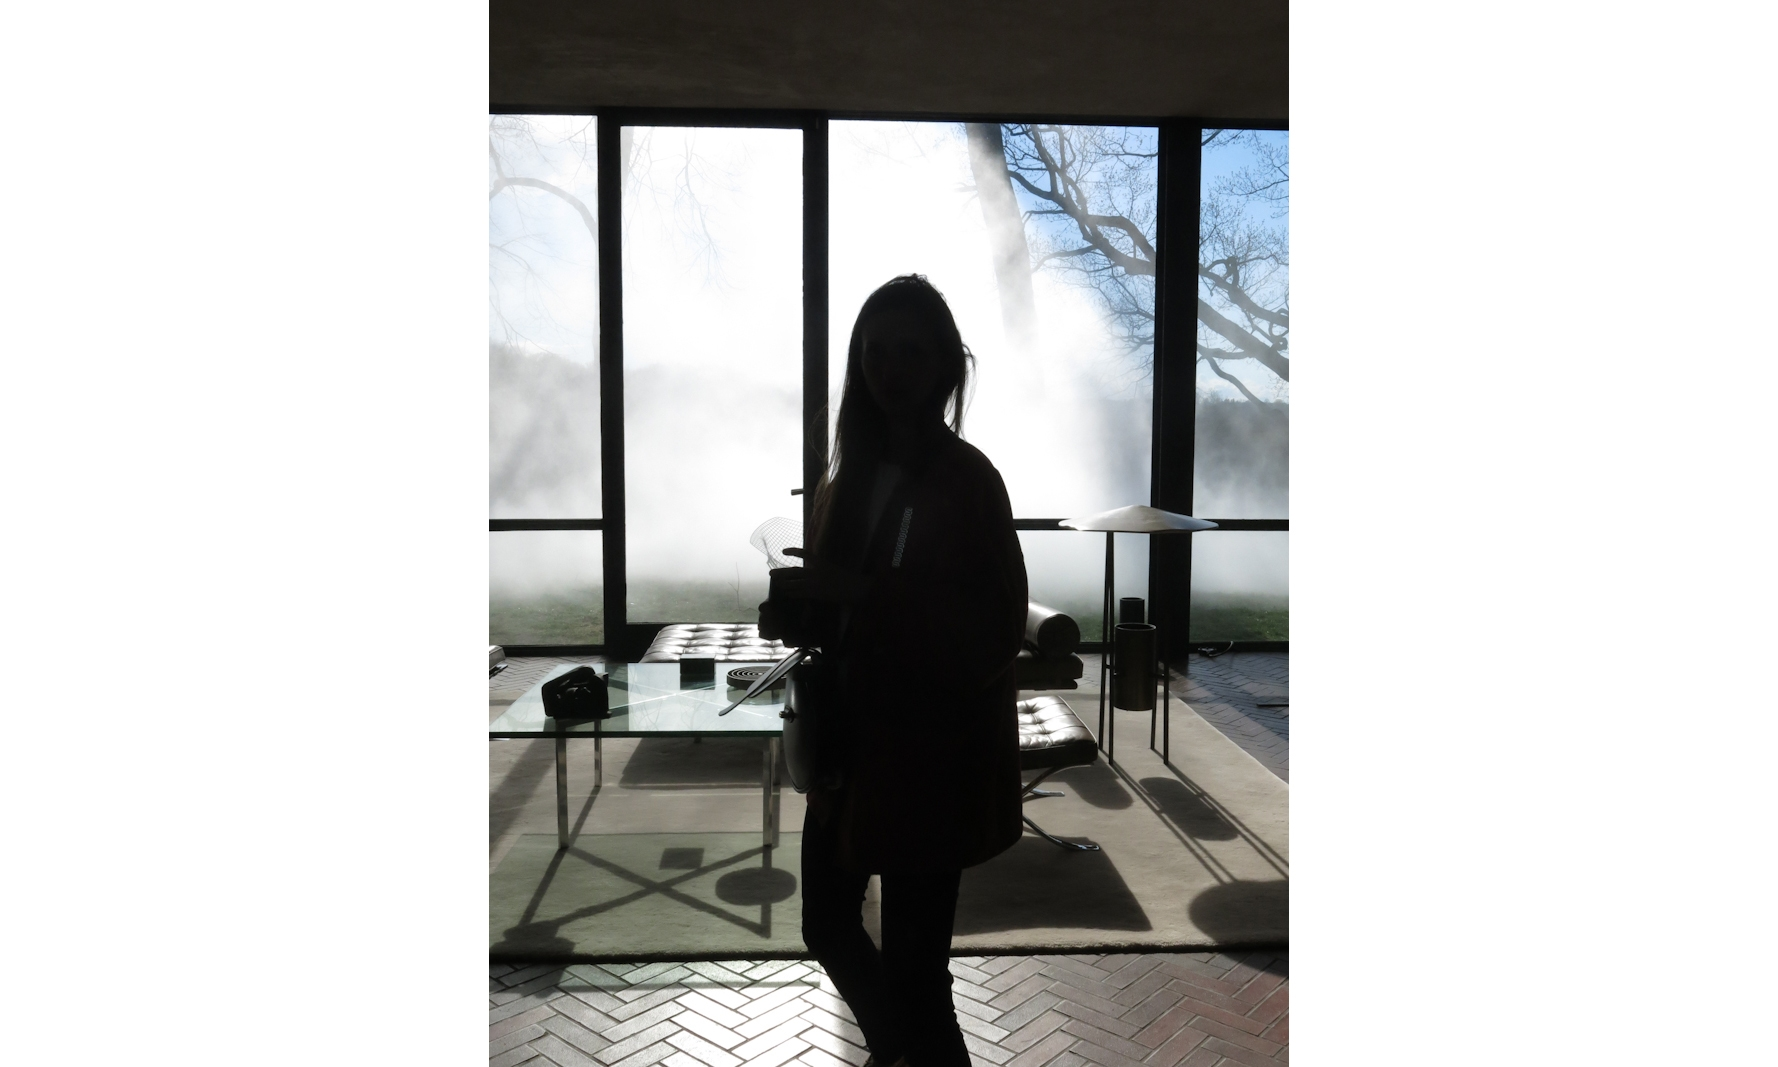 bureau-des-recommandations-travel-the-glass-house-philip-johnson.jpg